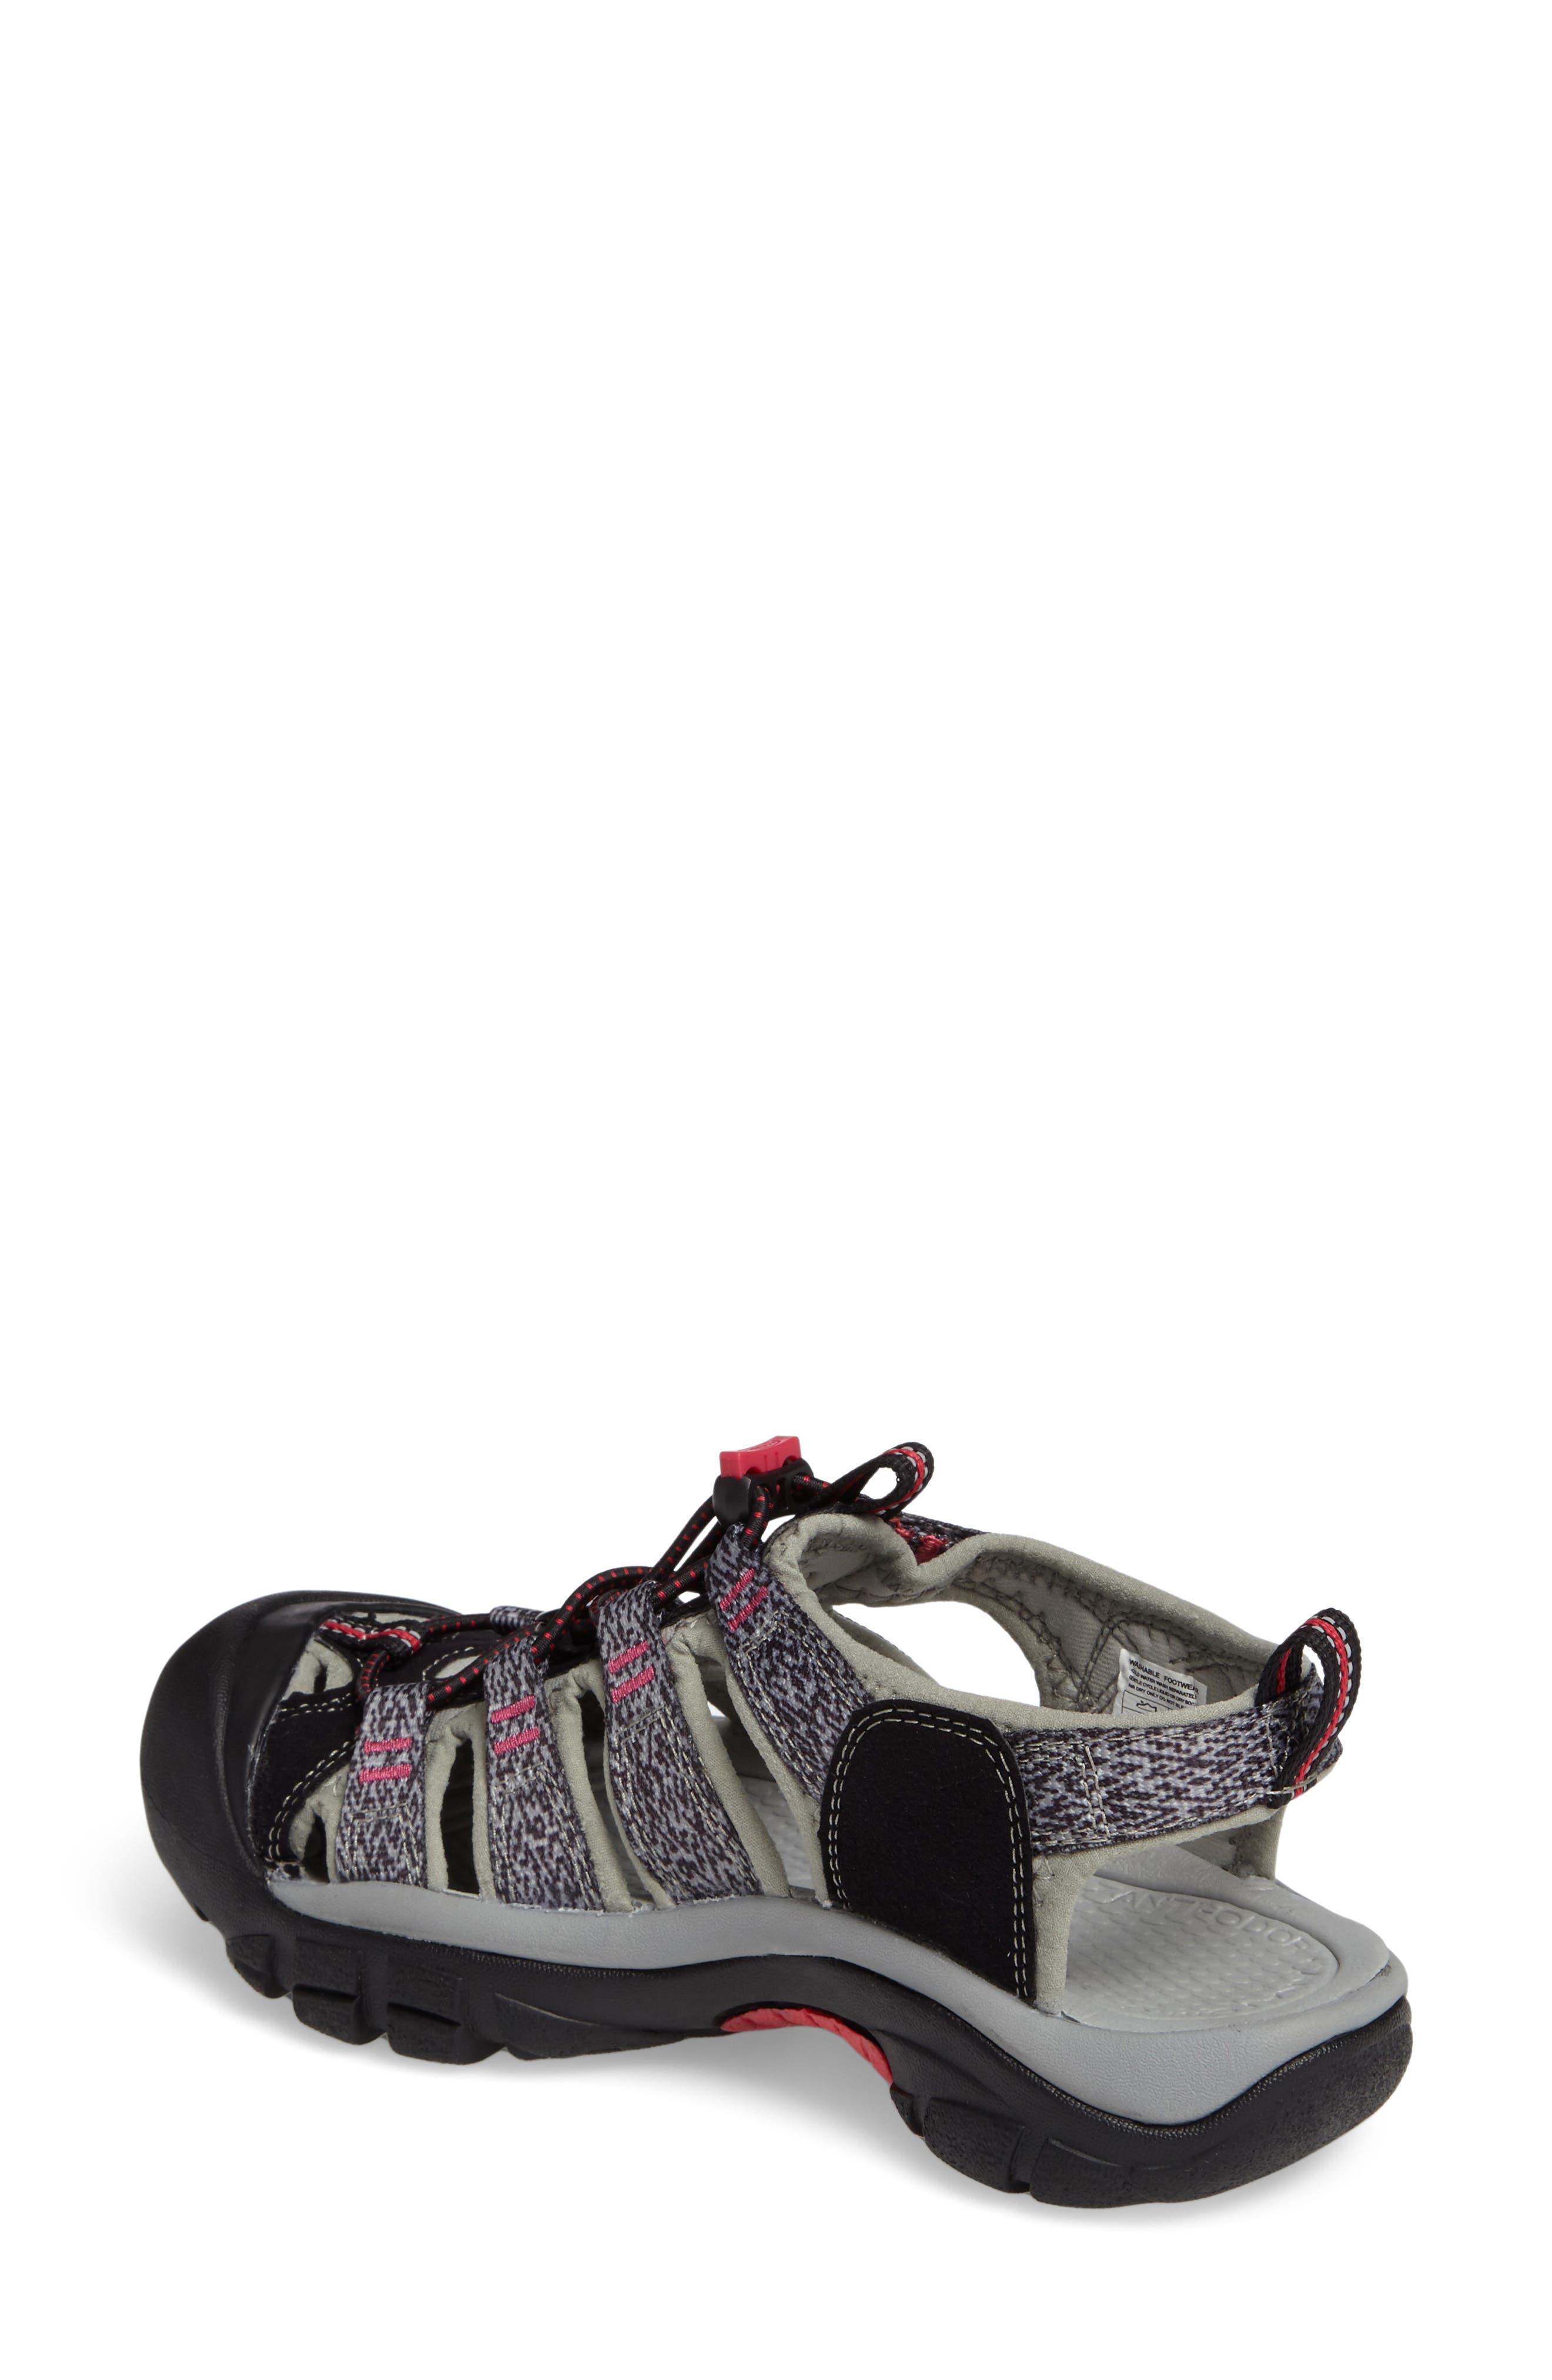 'Newport H2' Sandal,                             Alternate thumbnail 2, color,                             Black/ Bright Rose Fabric